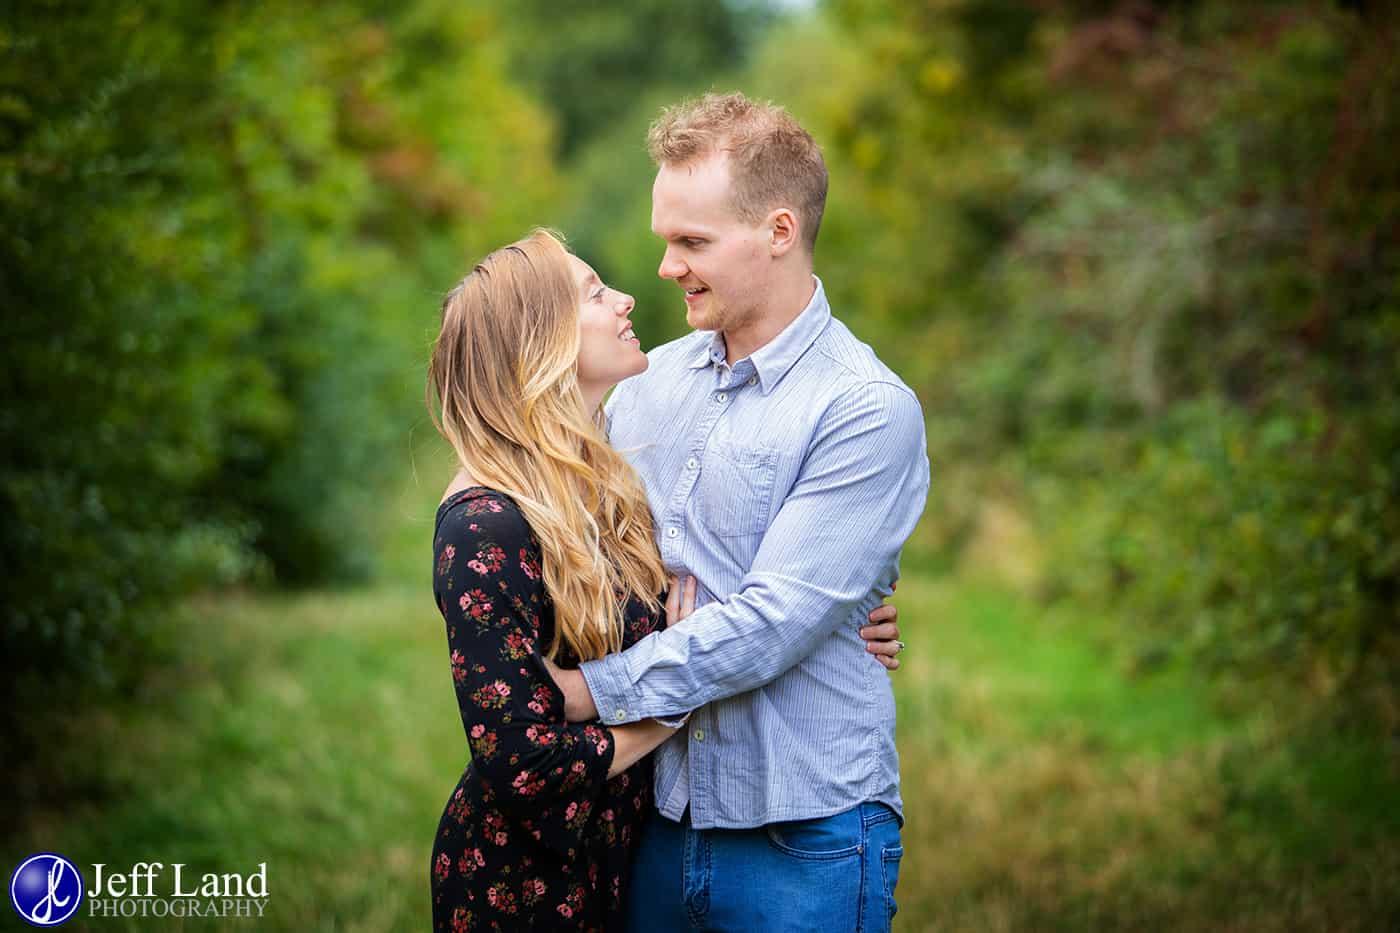 dating warwickshirebest dating sites to meet someone